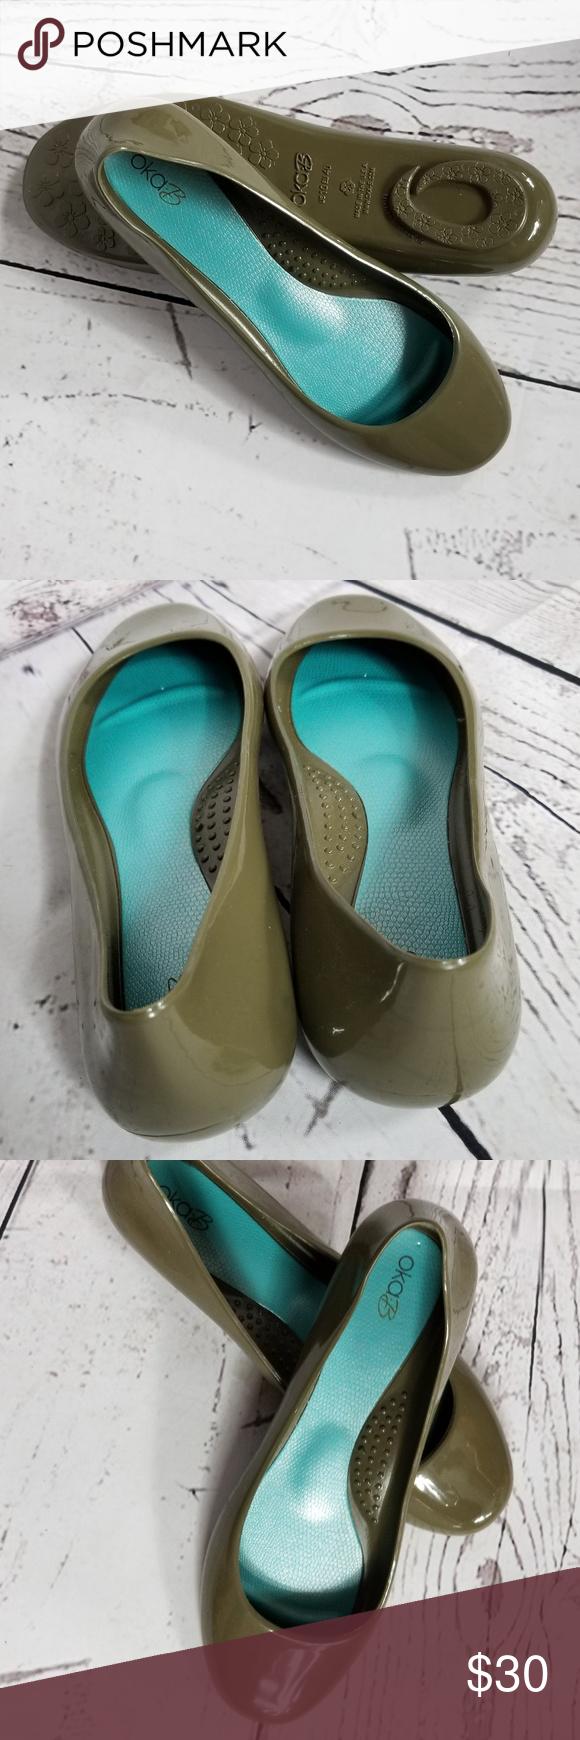 8e7baa2b9d24a8 Oka b. Taylor Ballet Flats Oka b. Taylor Ballet Flats in olive green . New  without box!!! OKA b. Shoes Flats   Loafers